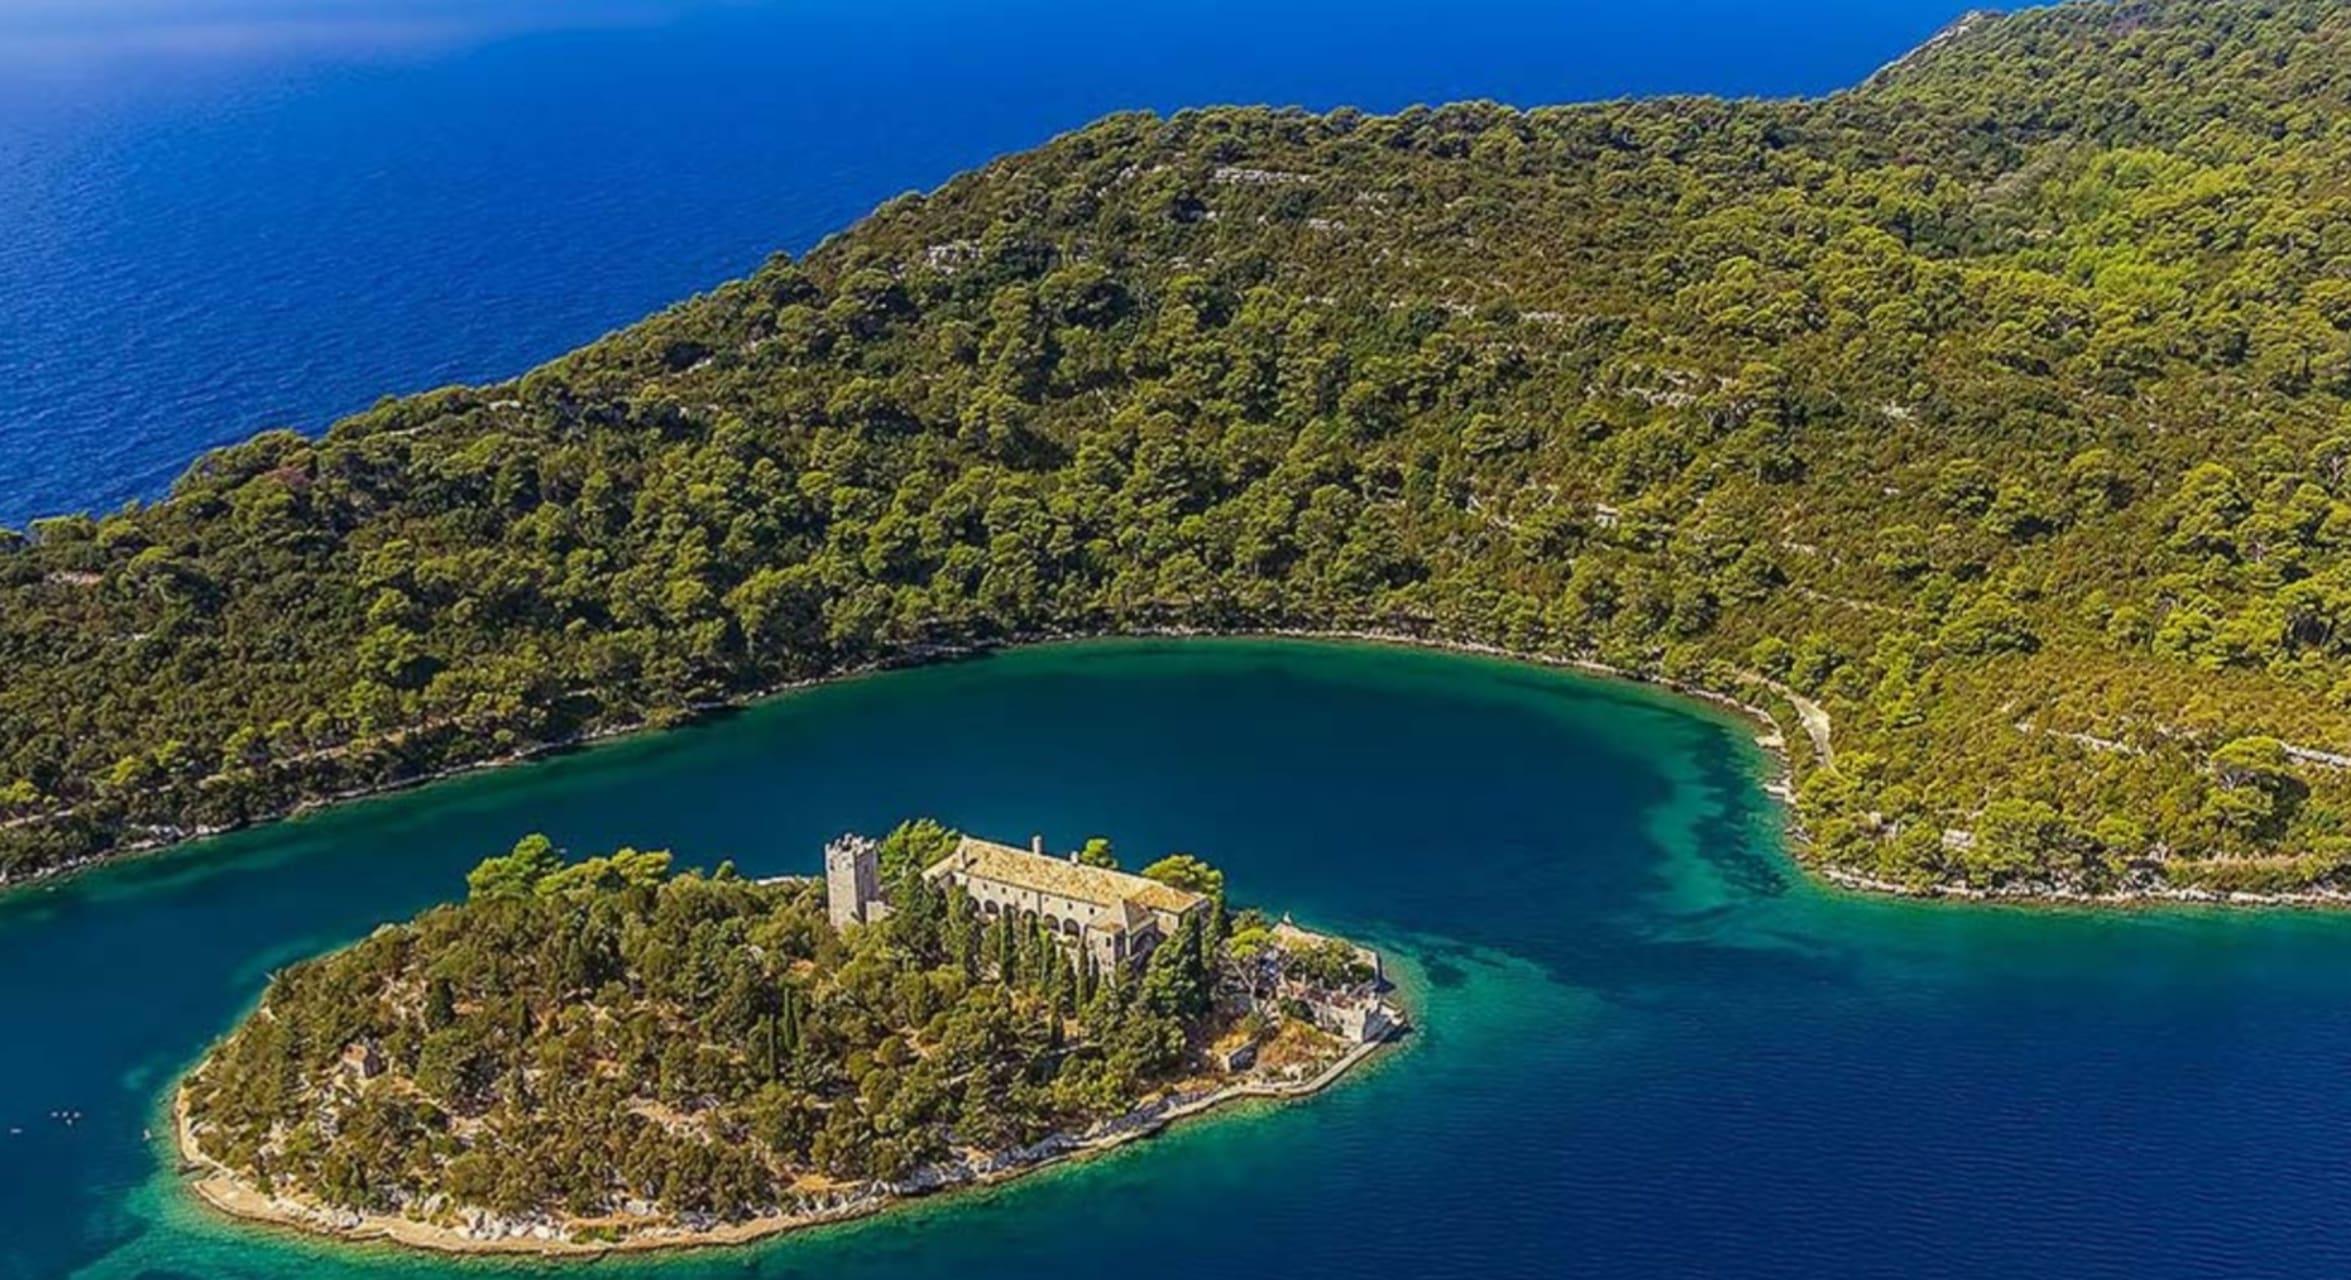 Mljet National Park - National Park of Mljet Boat Ride on Saltwater Lakes